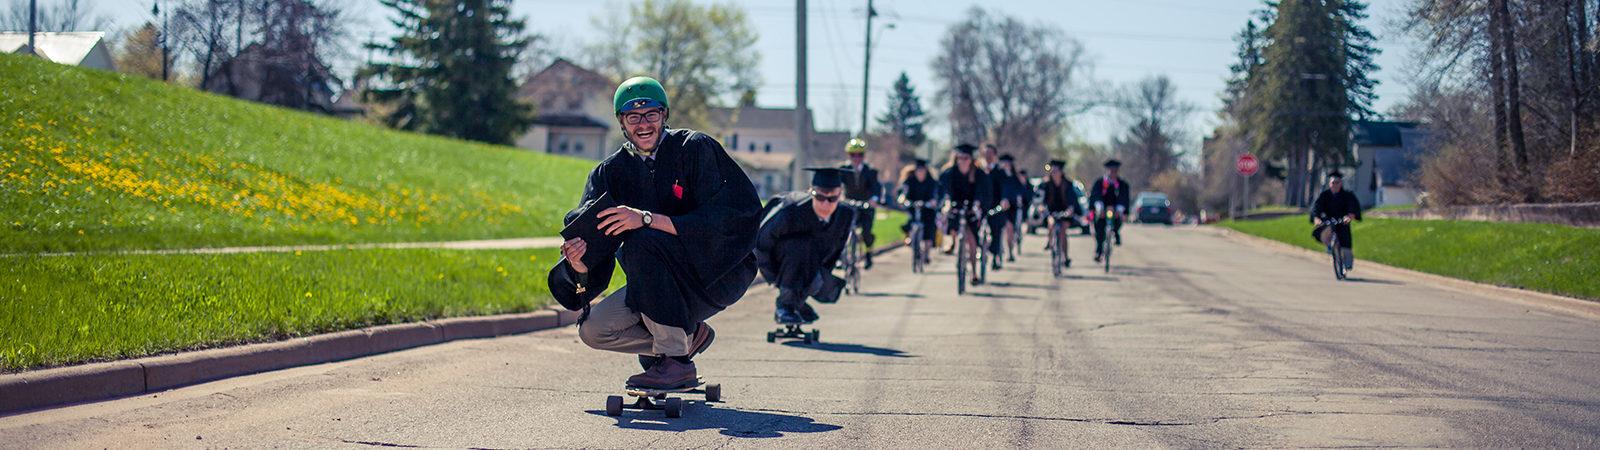 students skateboarding at graduation